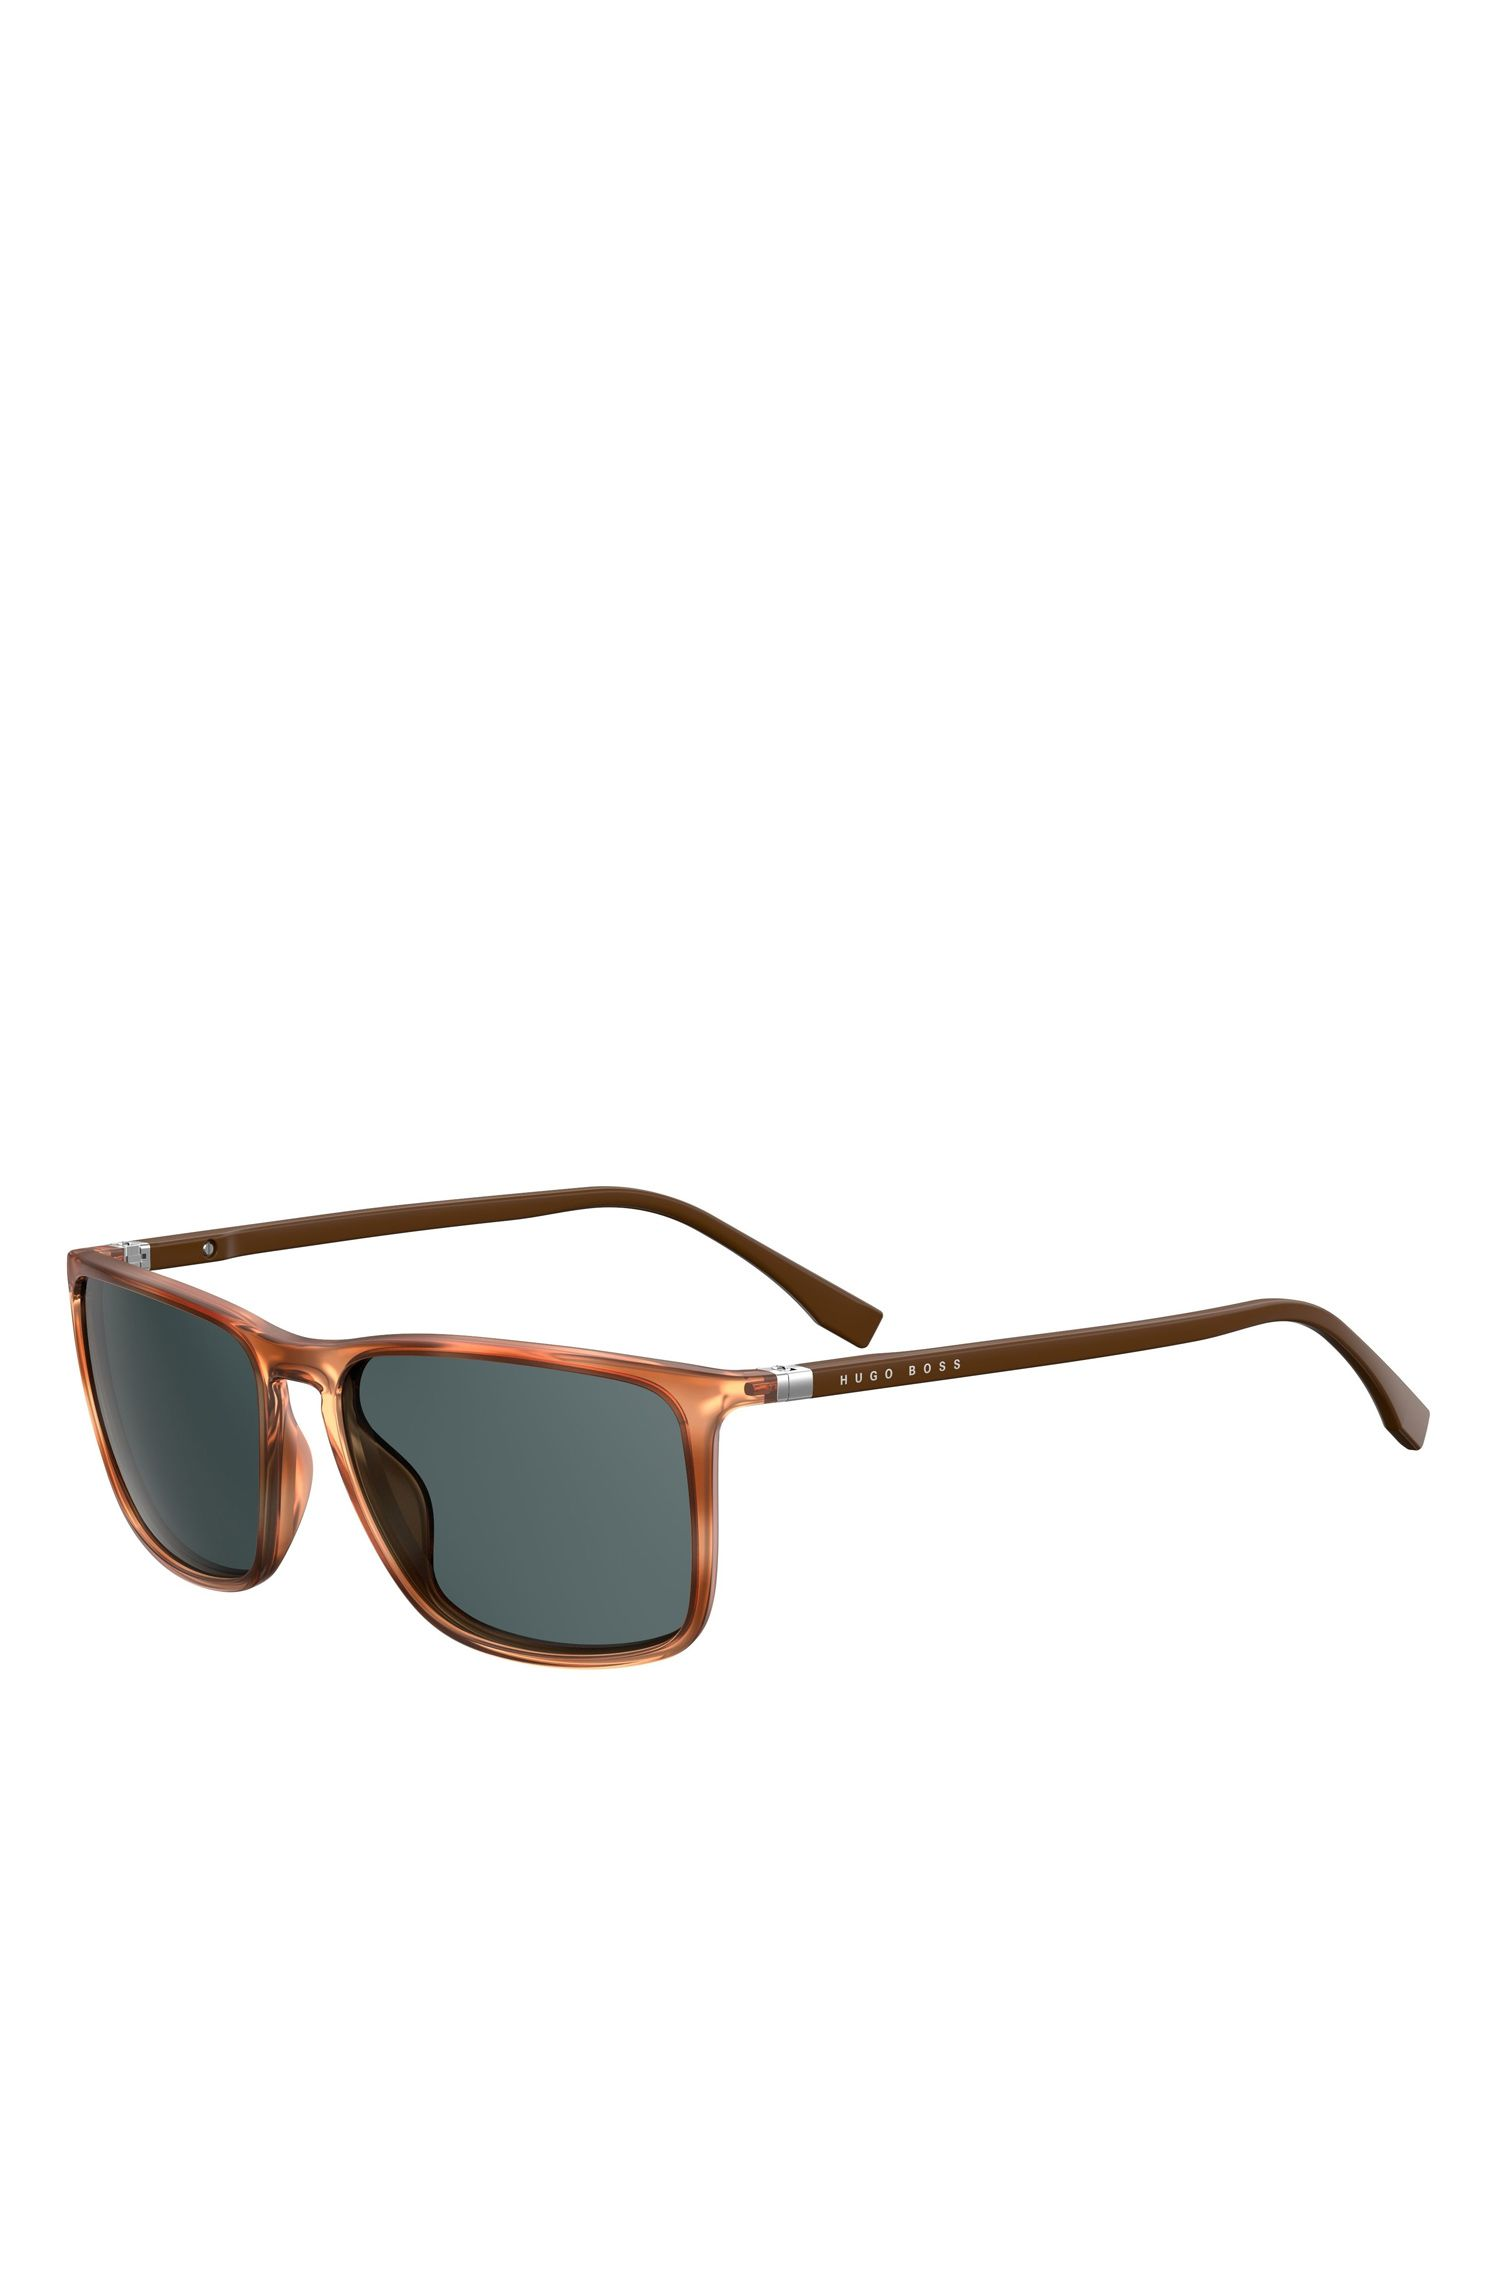 Grey Lens Rectangular Sunglasses | BOSS 0665S